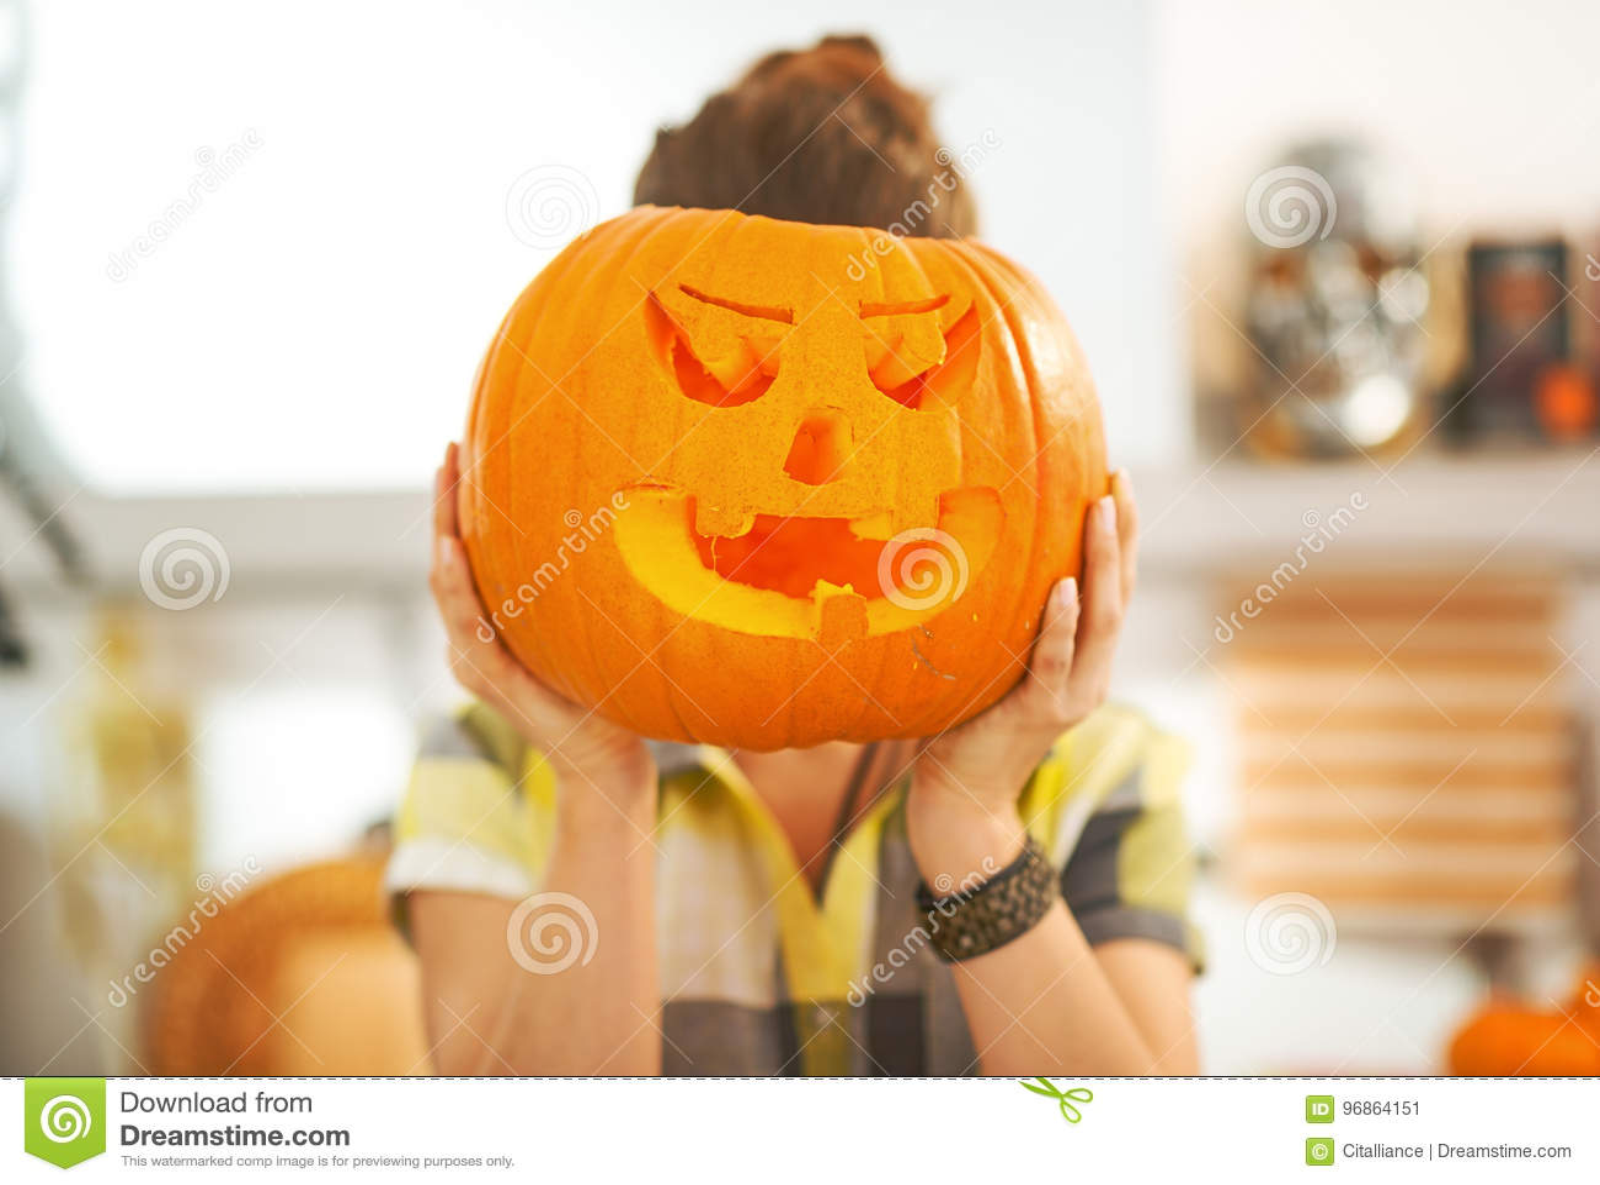 kitchen lanterns modern sink 拿着在头前面的主妇一个大杰克o灯笼南瓜库存图片 图片包括有当事人 在途中的可怕的款待主妇画象在万圣夜装饰了拿着在头前面的厨房一个大橙色南瓜杰克o灯笼